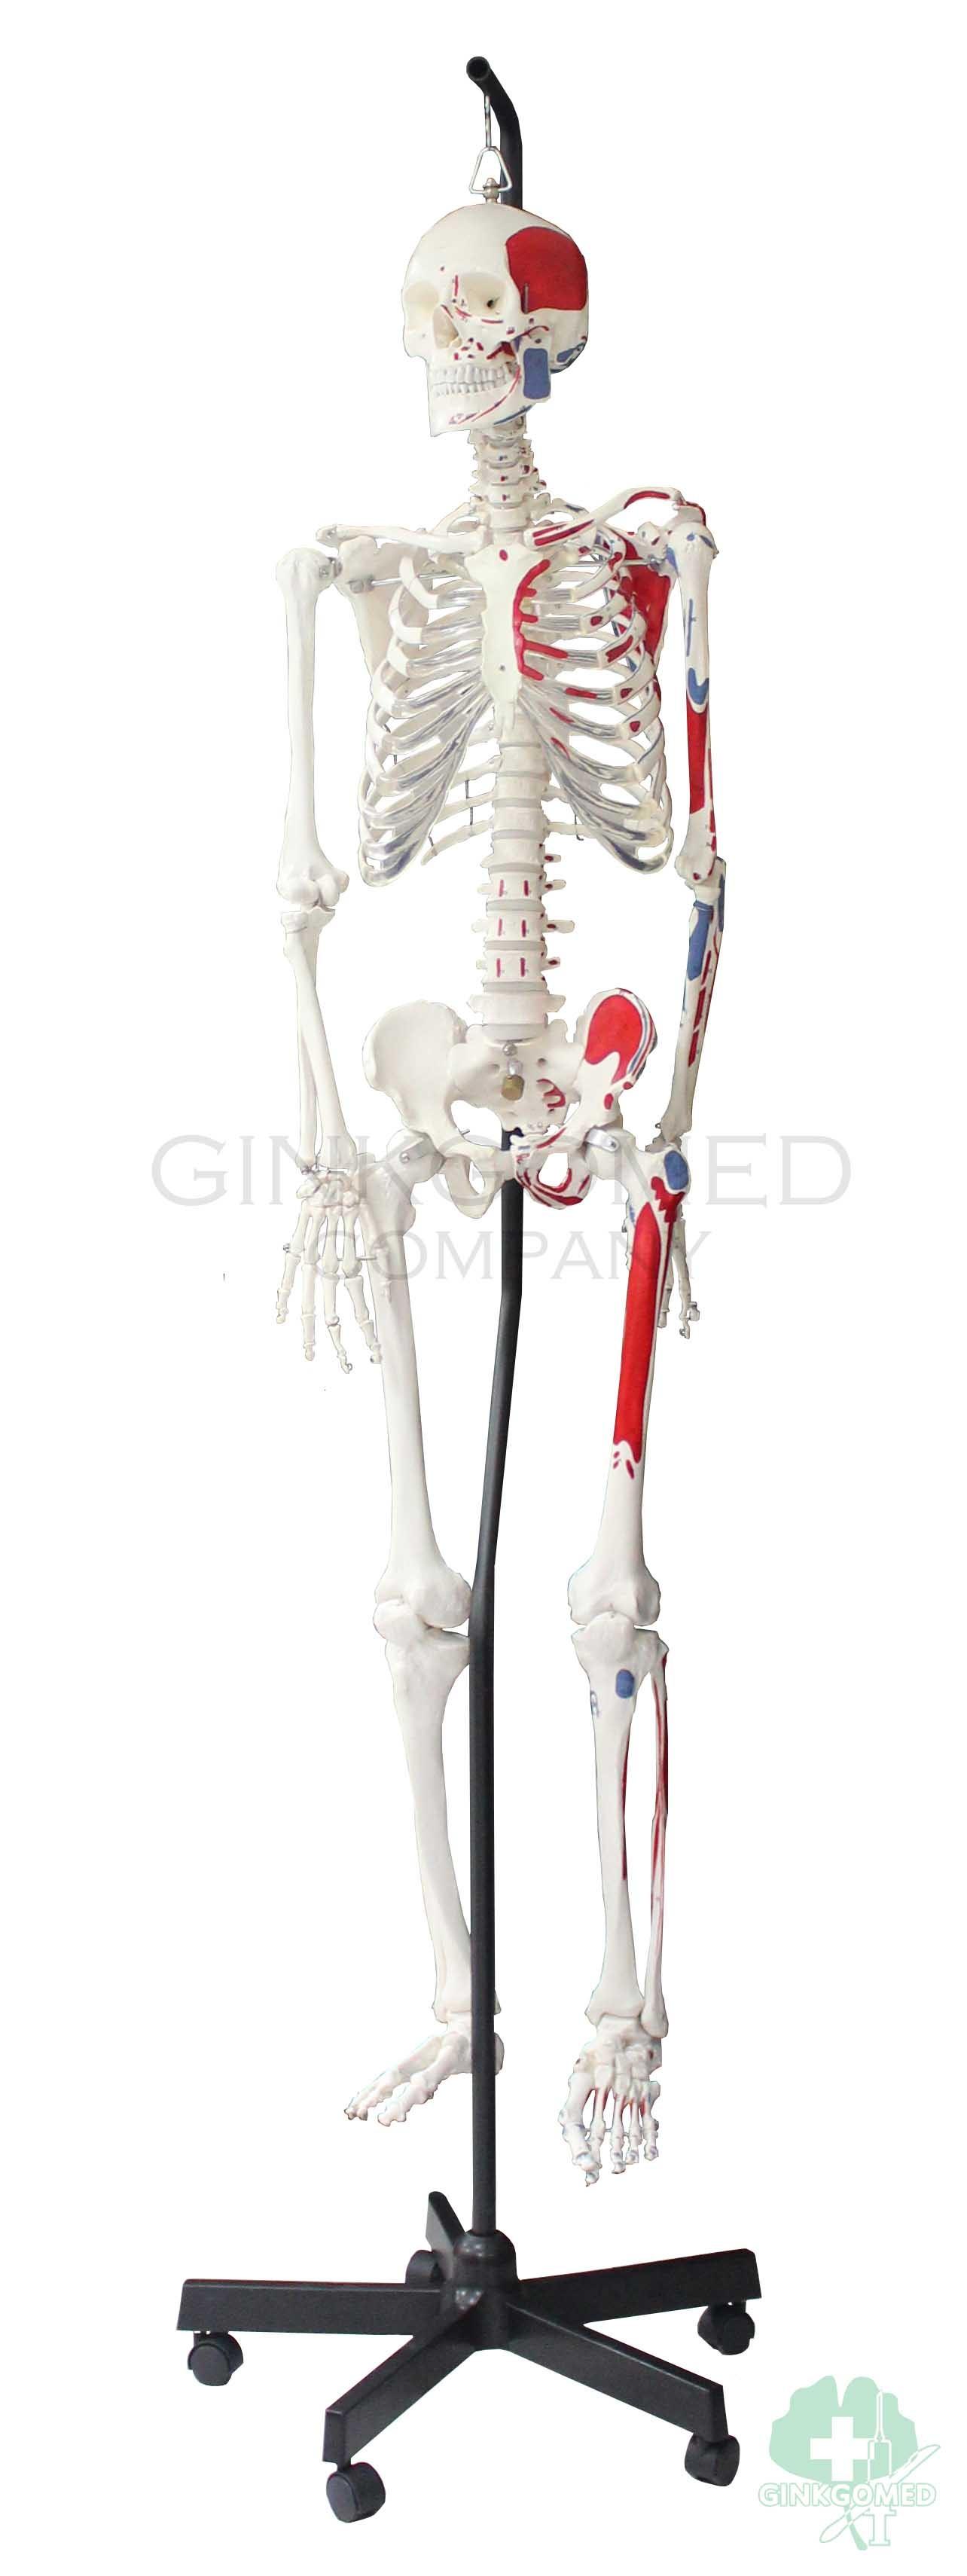 Gm 010057 Hangable Human Skeleton With Muscular Labeling